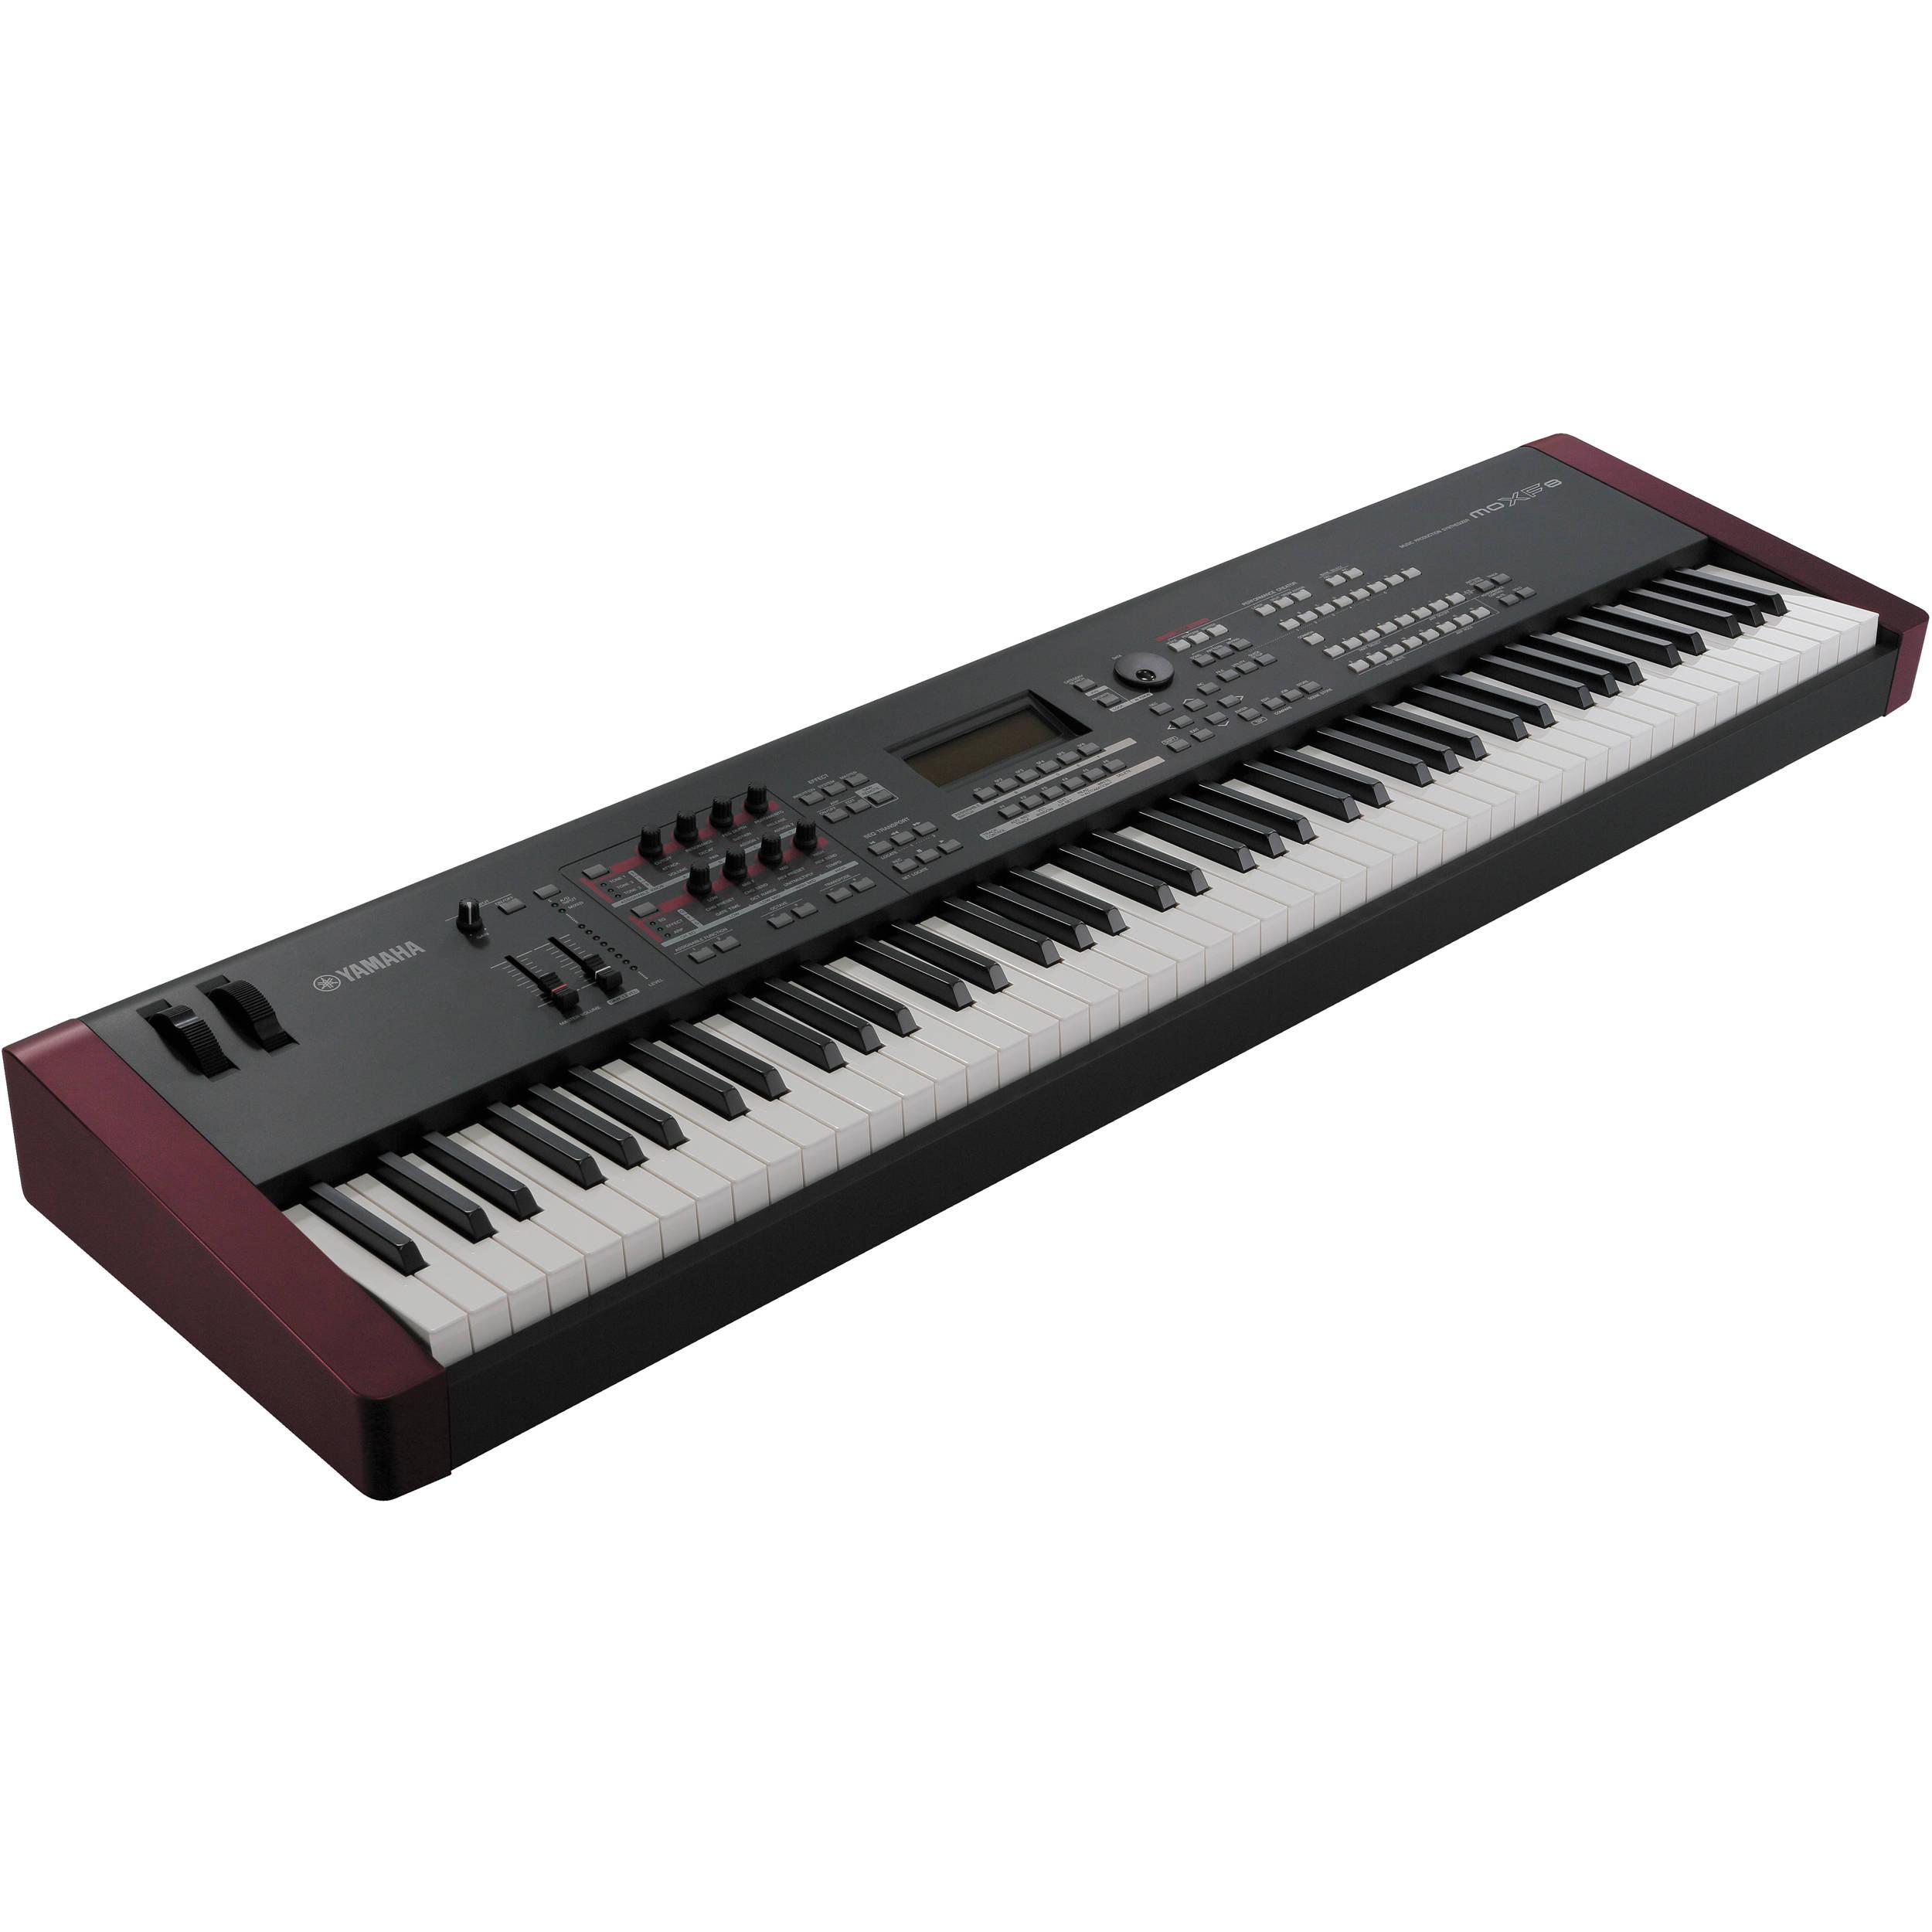 yamaha moxf8 keyboard workstation moxf8 b h photo video. Black Bedroom Furniture Sets. Home Design Ideas